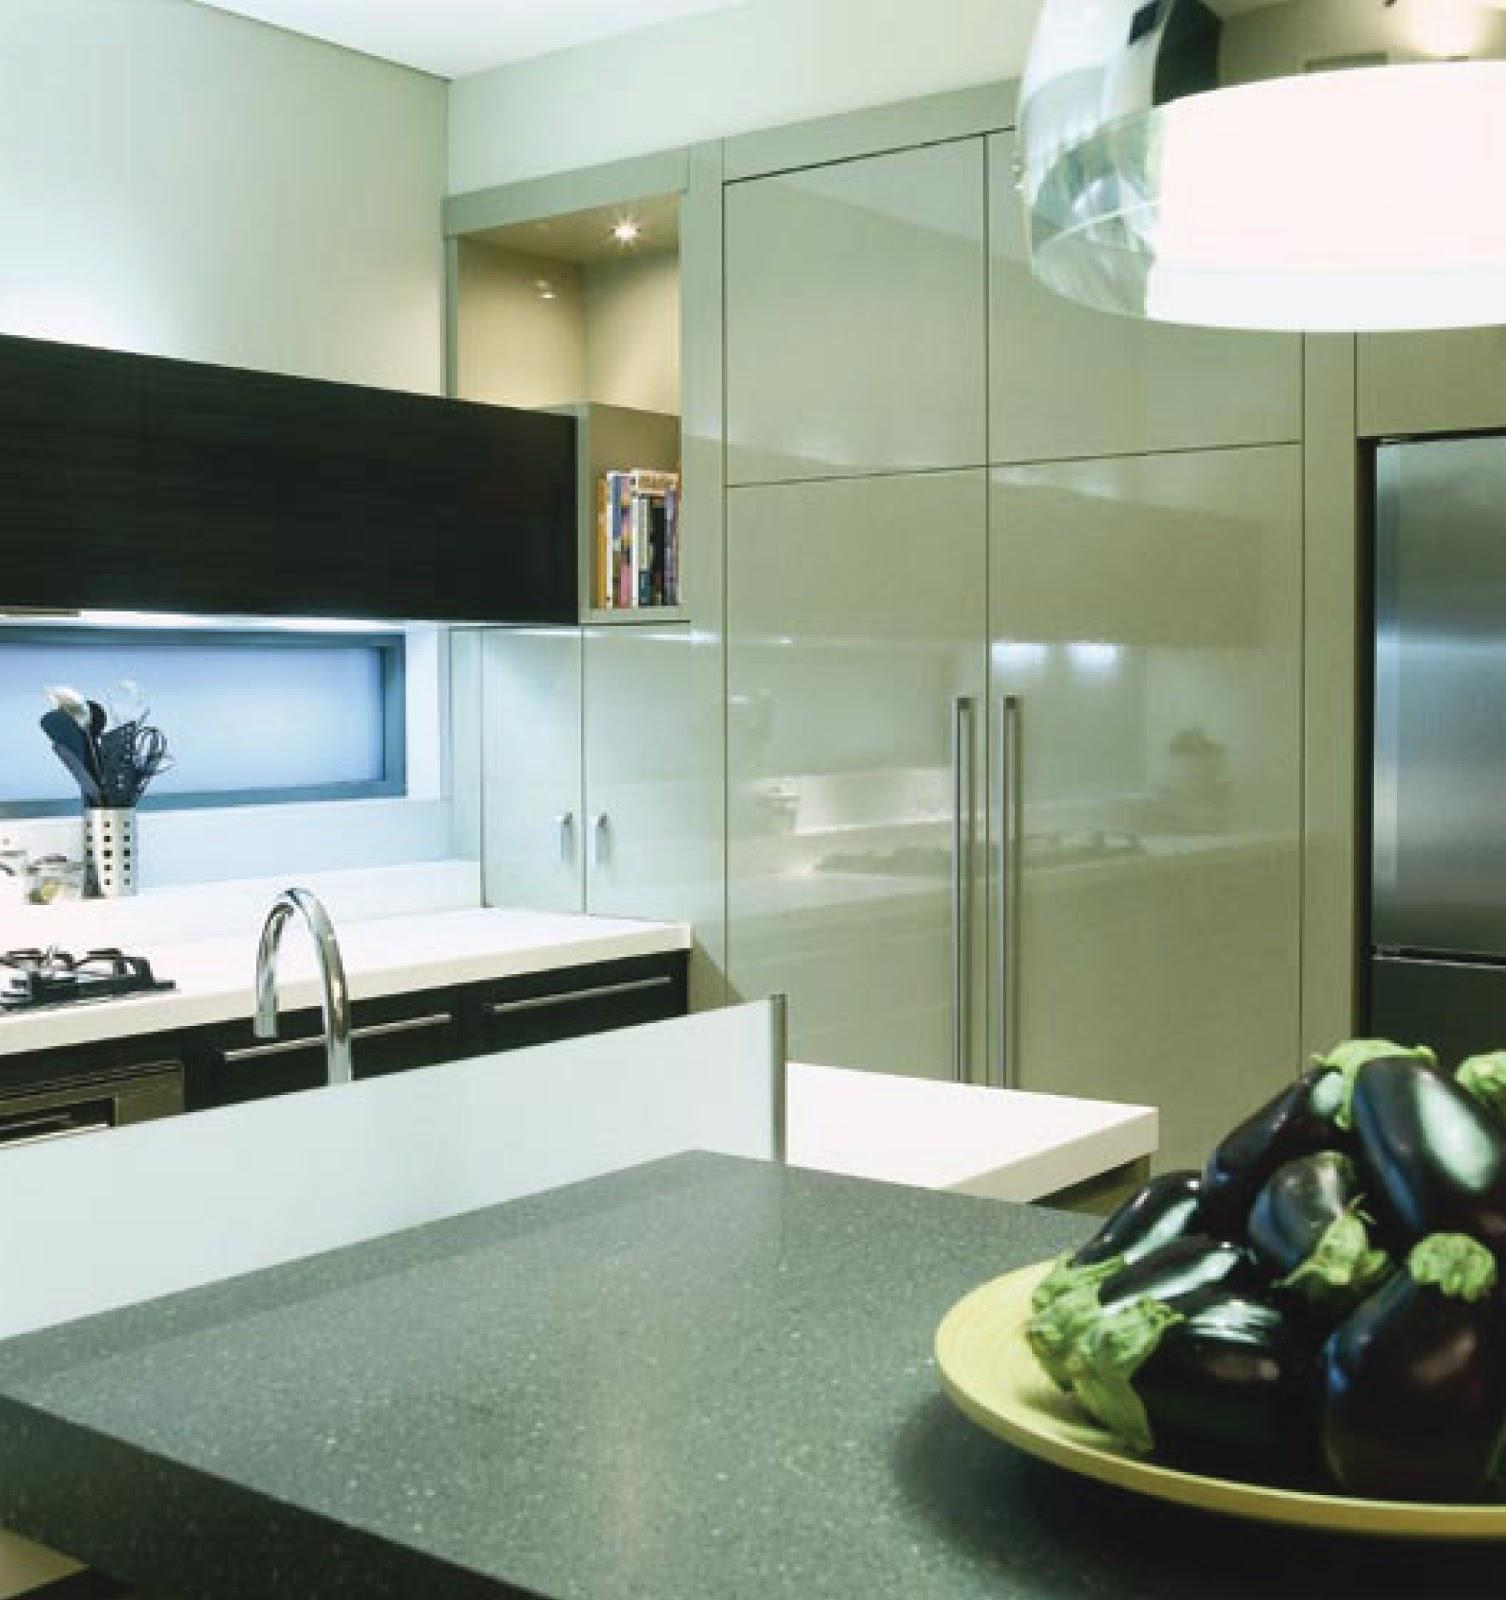 Minosa kitchen design the balancing act between design for Award winning kitchen island designs